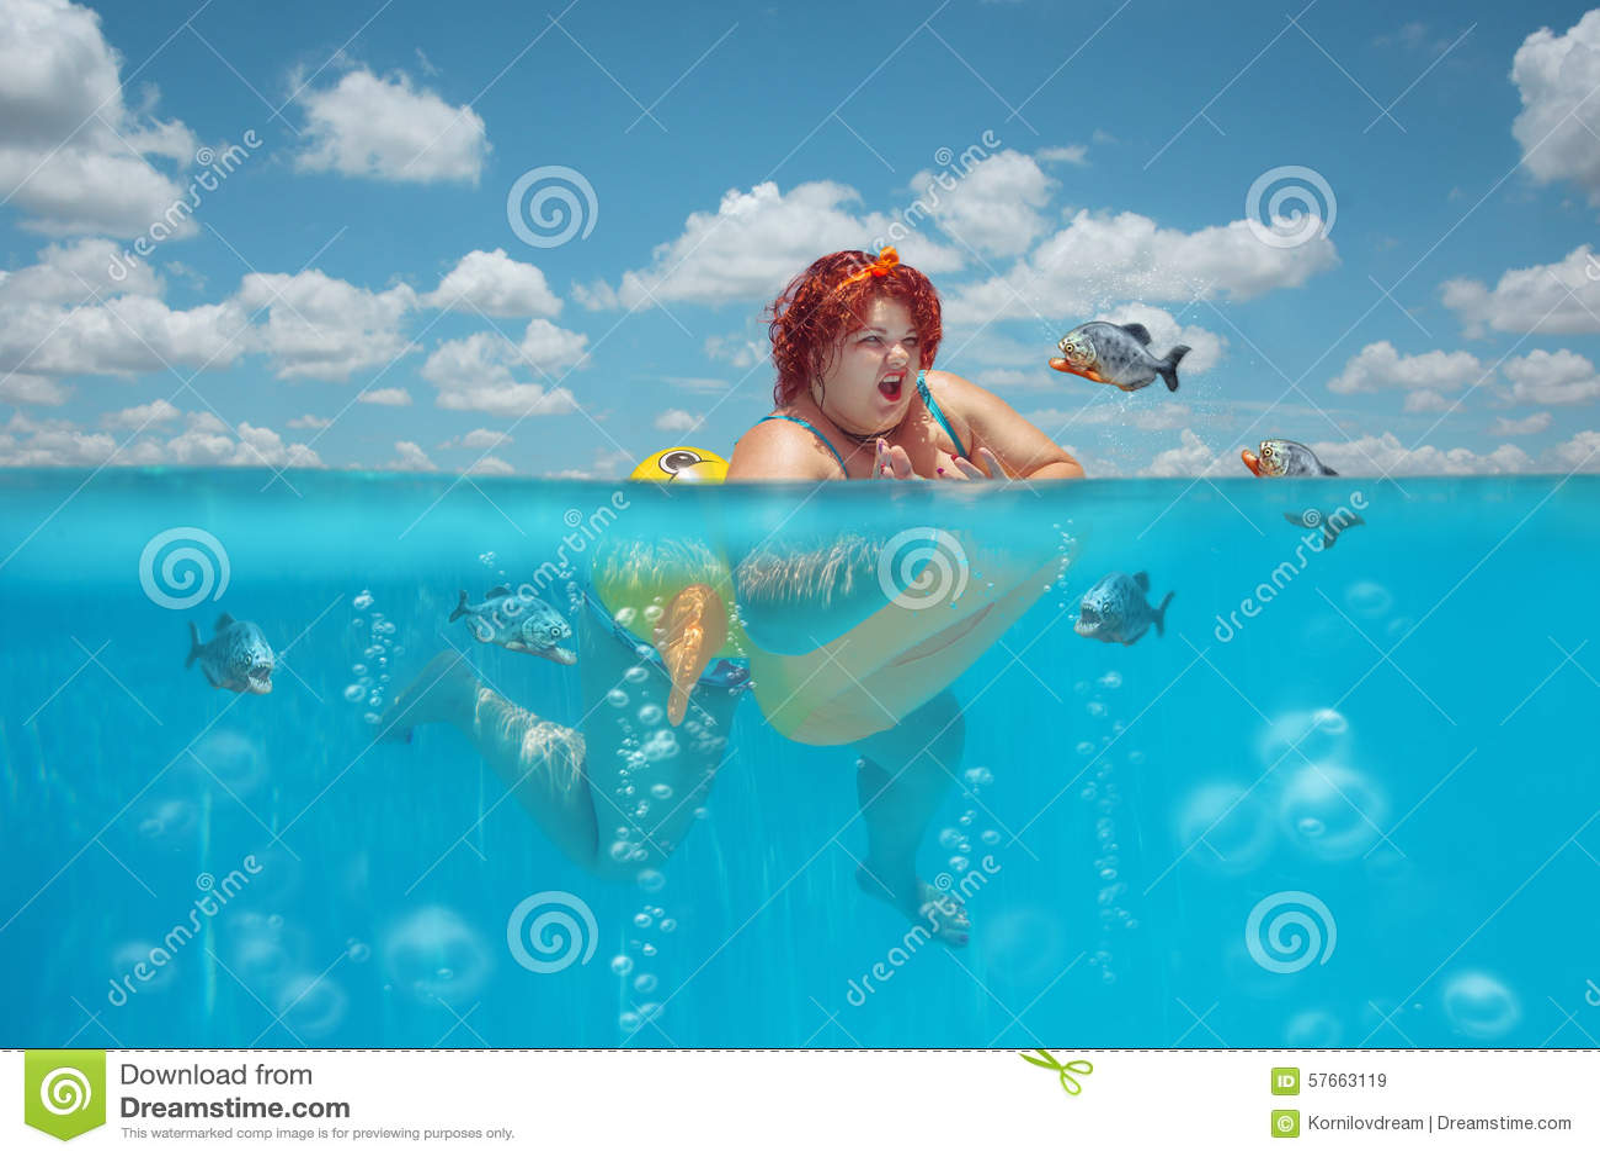 Tłusta kobieta i piranhas